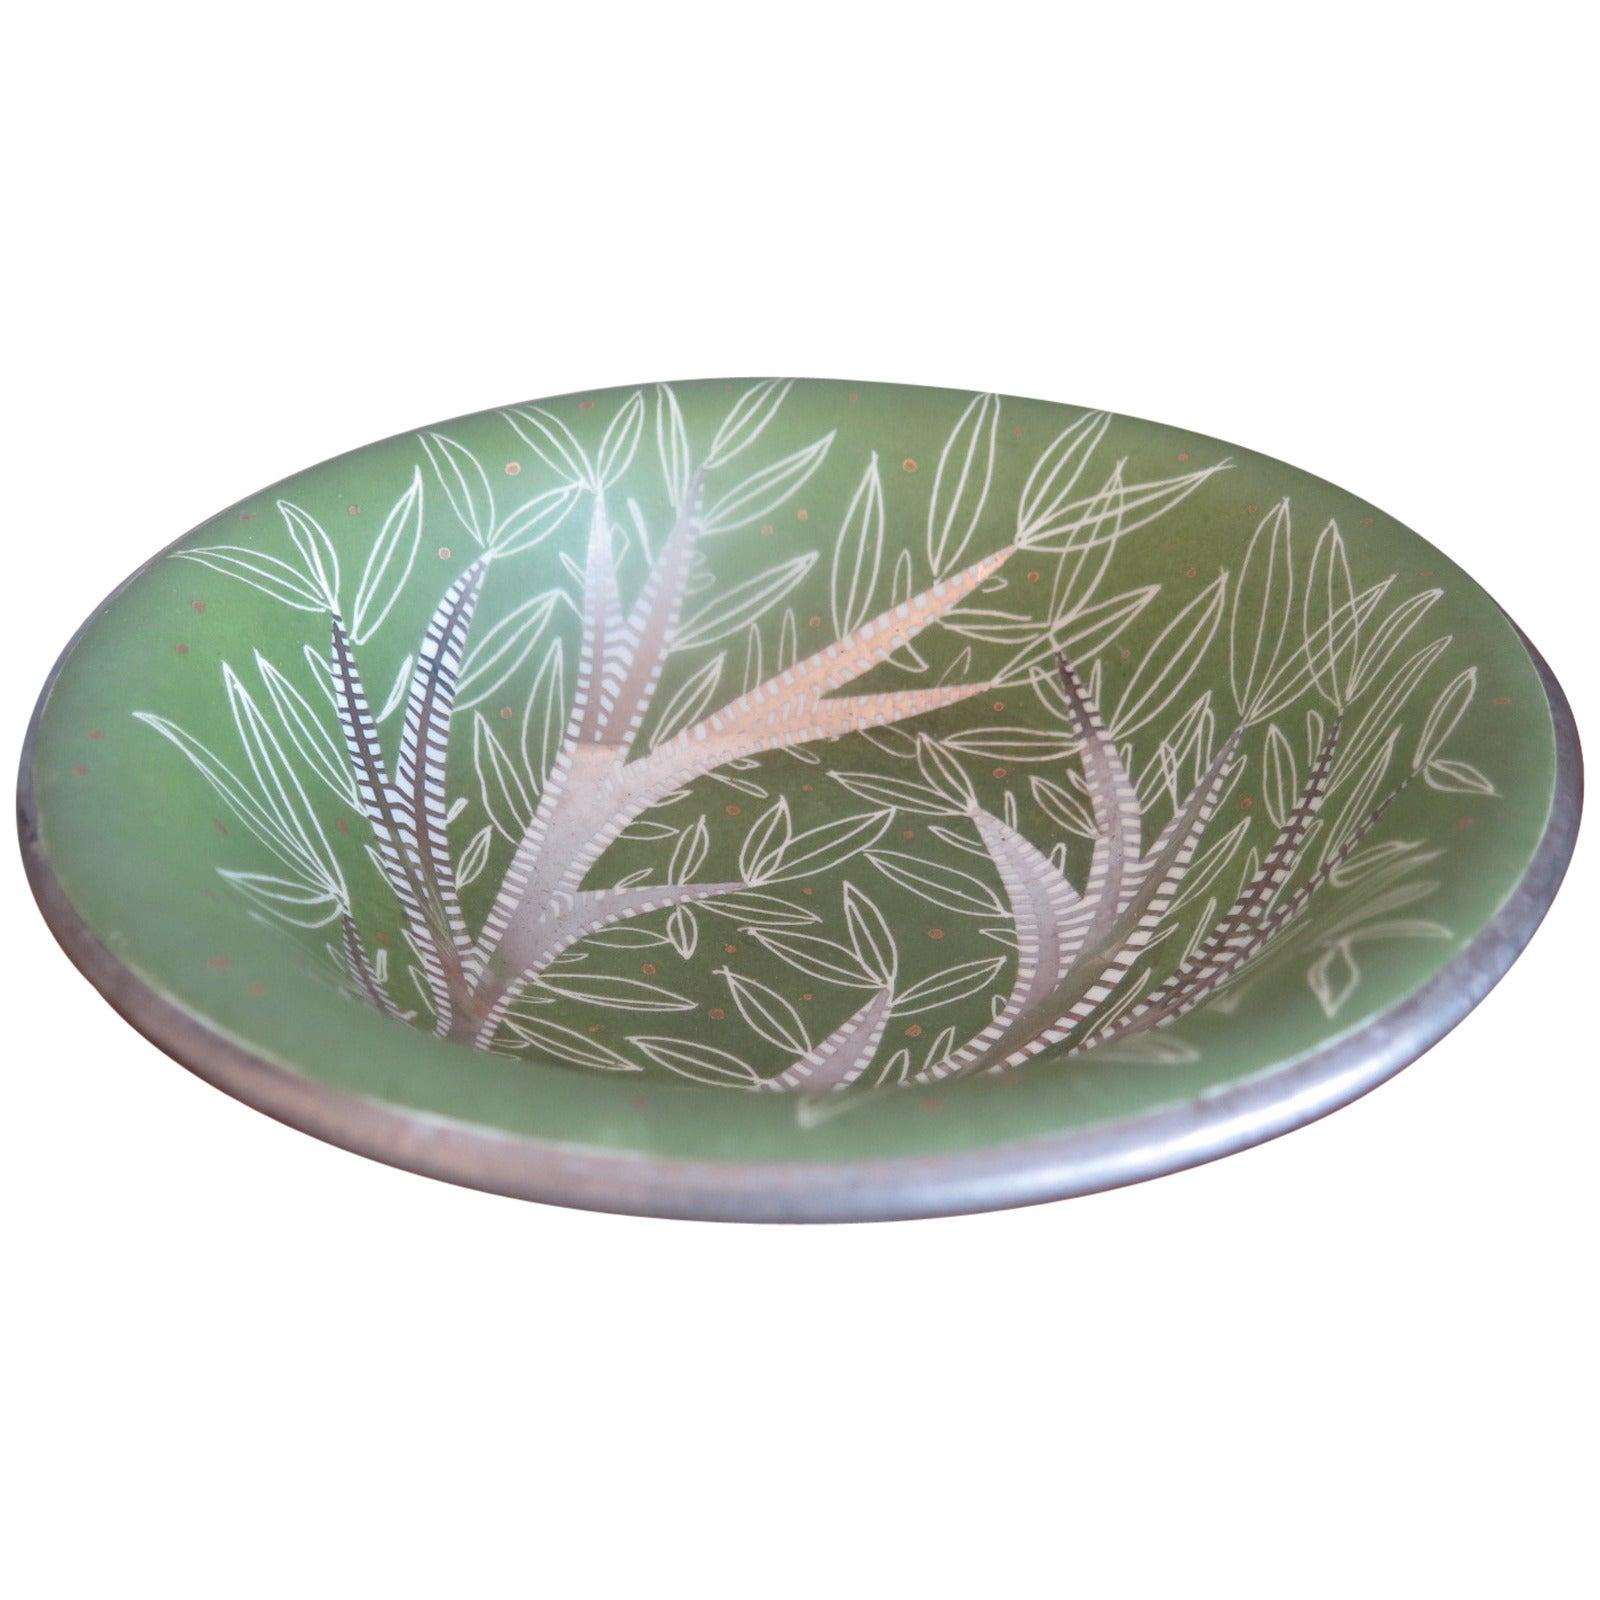 Waylande Gregory Ceramic Bowl